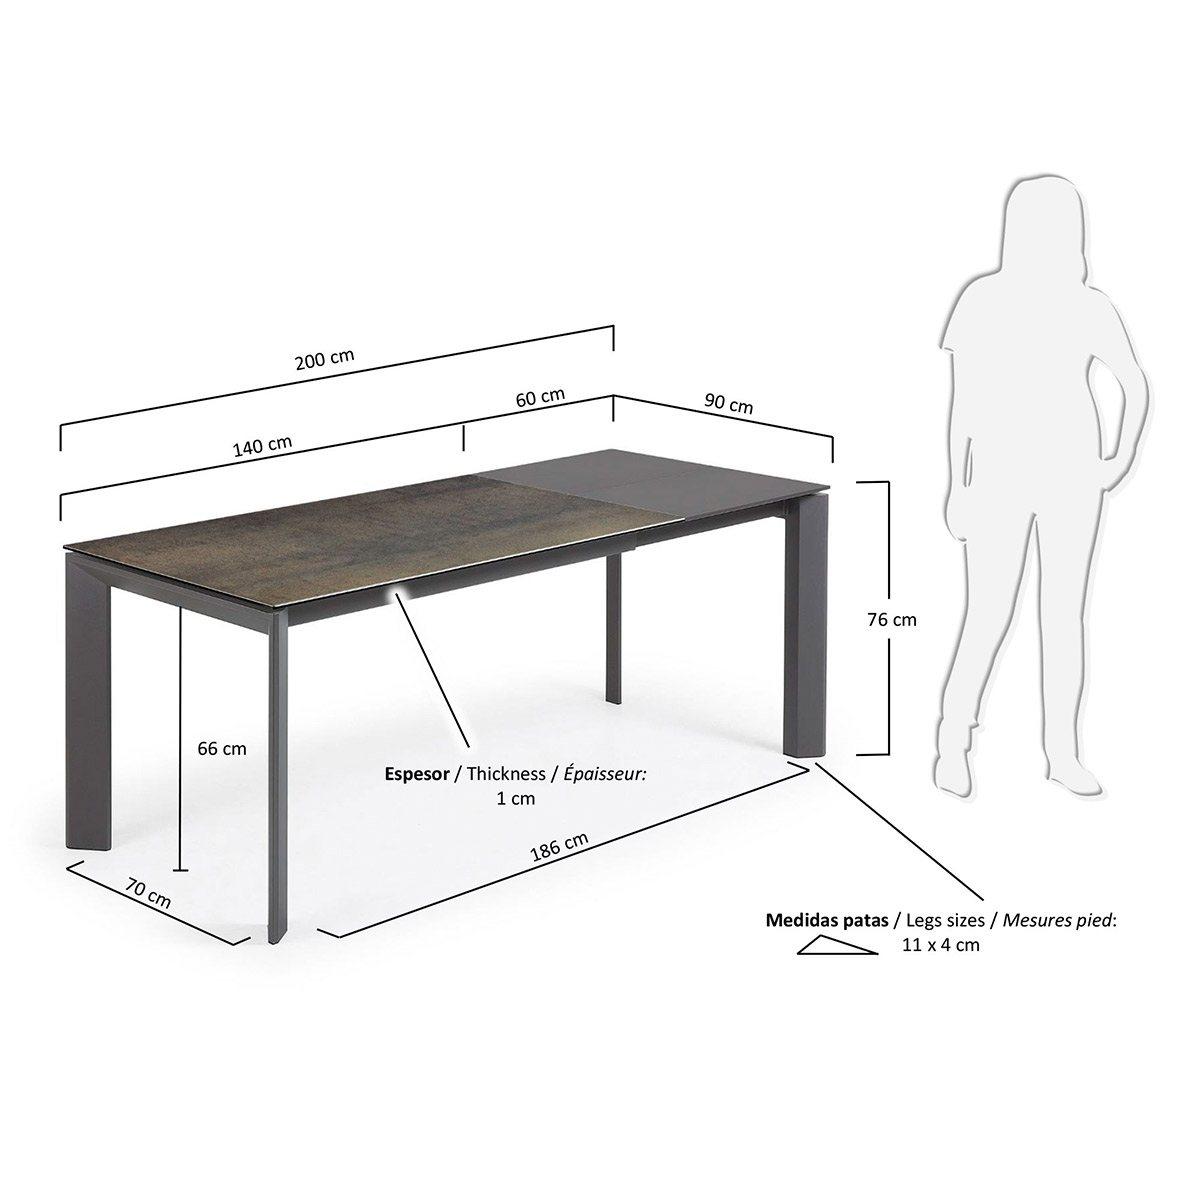 Mesa comedor extensible grafito- Artikalia - Mesas de metal